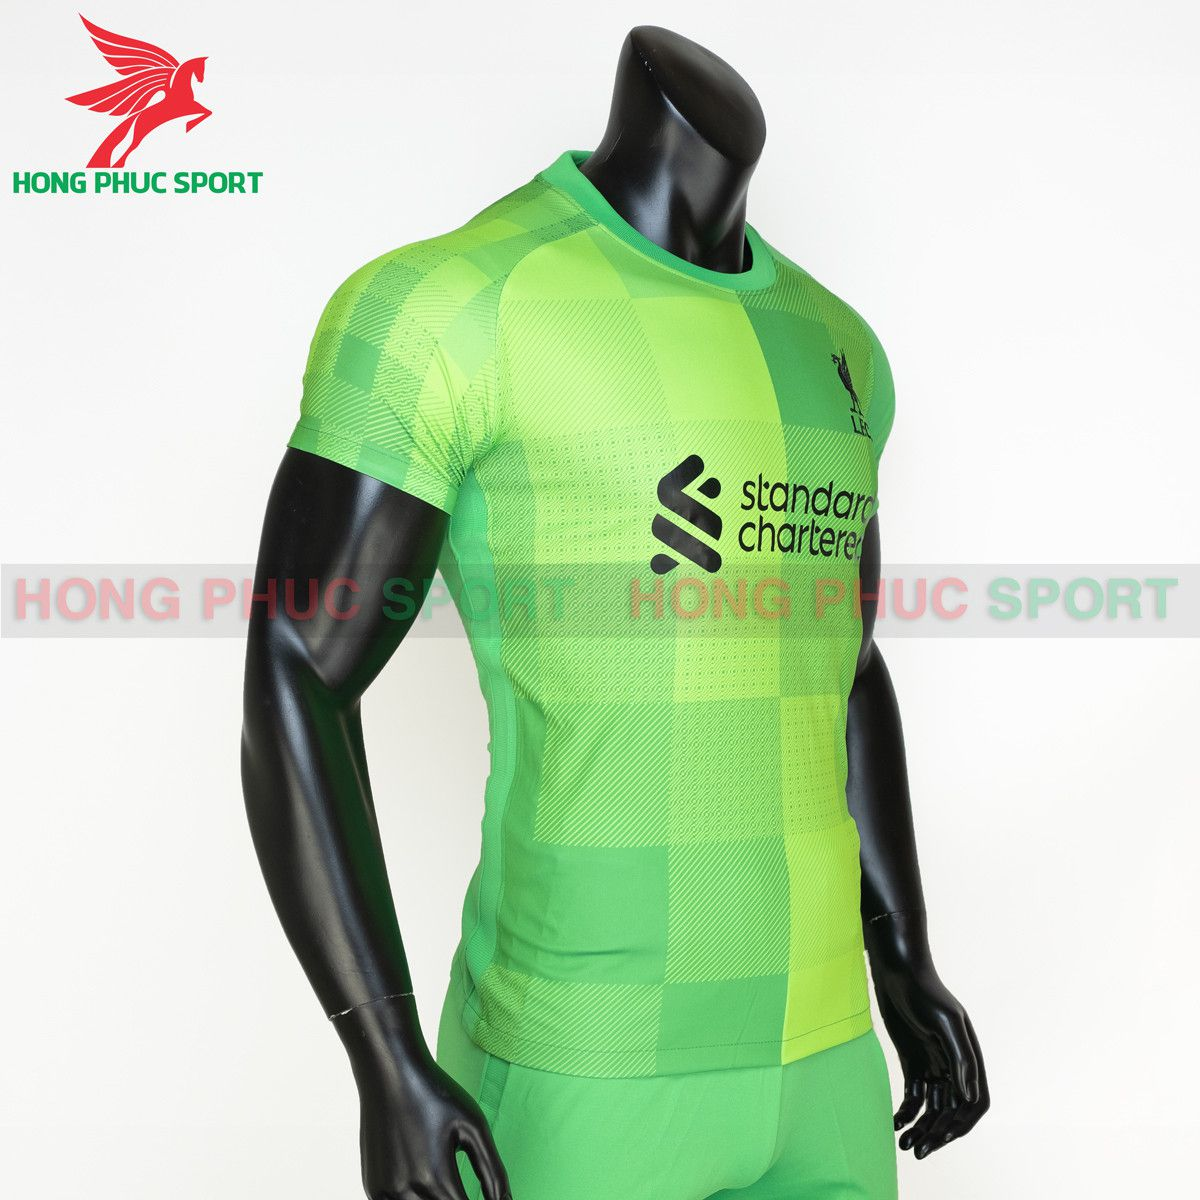 https://cdn.hongphucsport.com/unsafe/s4.shopbay.vn/files/285/ao-thu-mon-liverpool-2021-2022-thailand-5-6140311cb8388.jpg